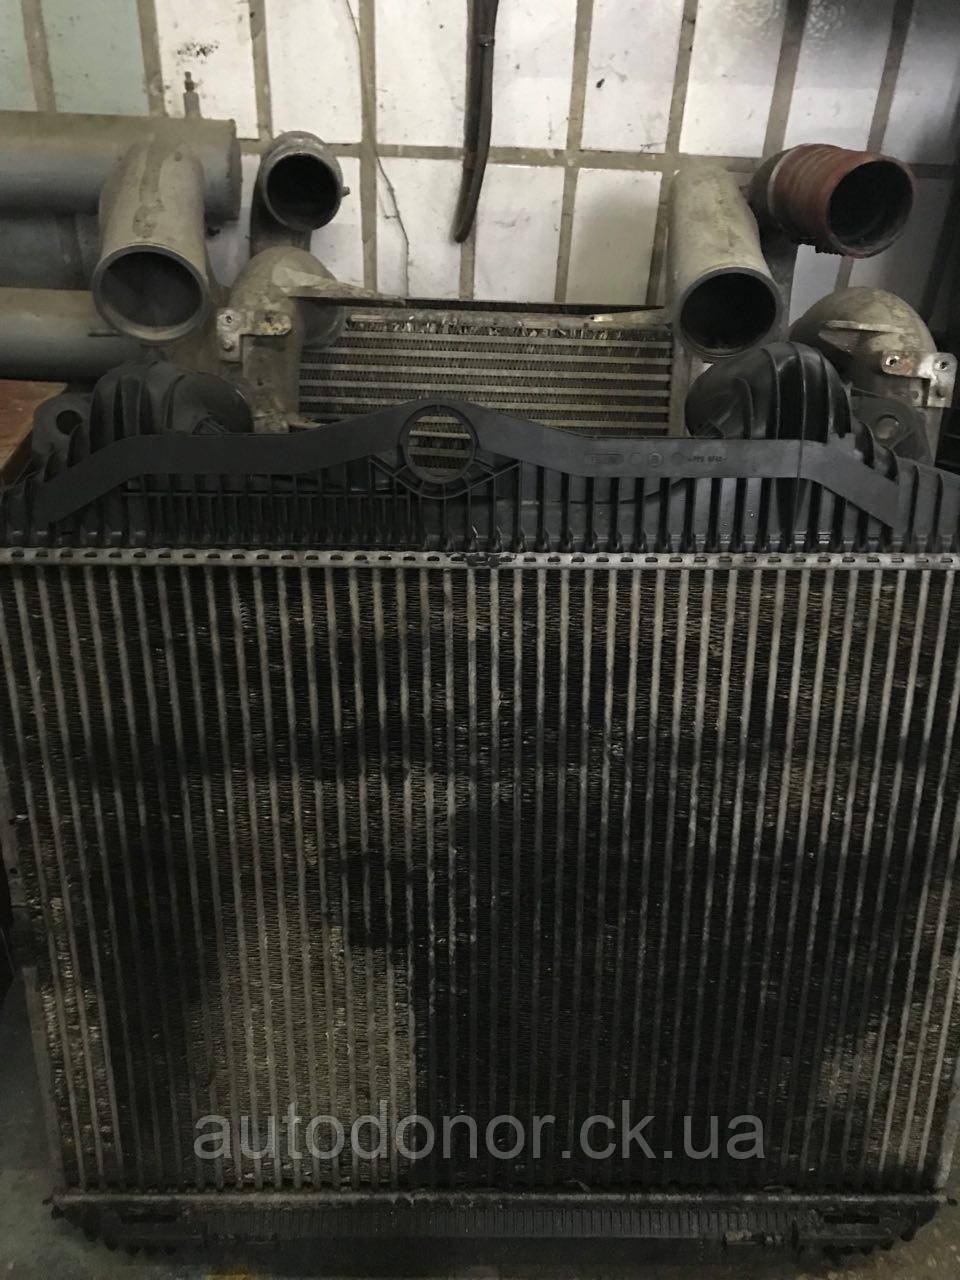 Радиатор DAF/даф/дафб/у